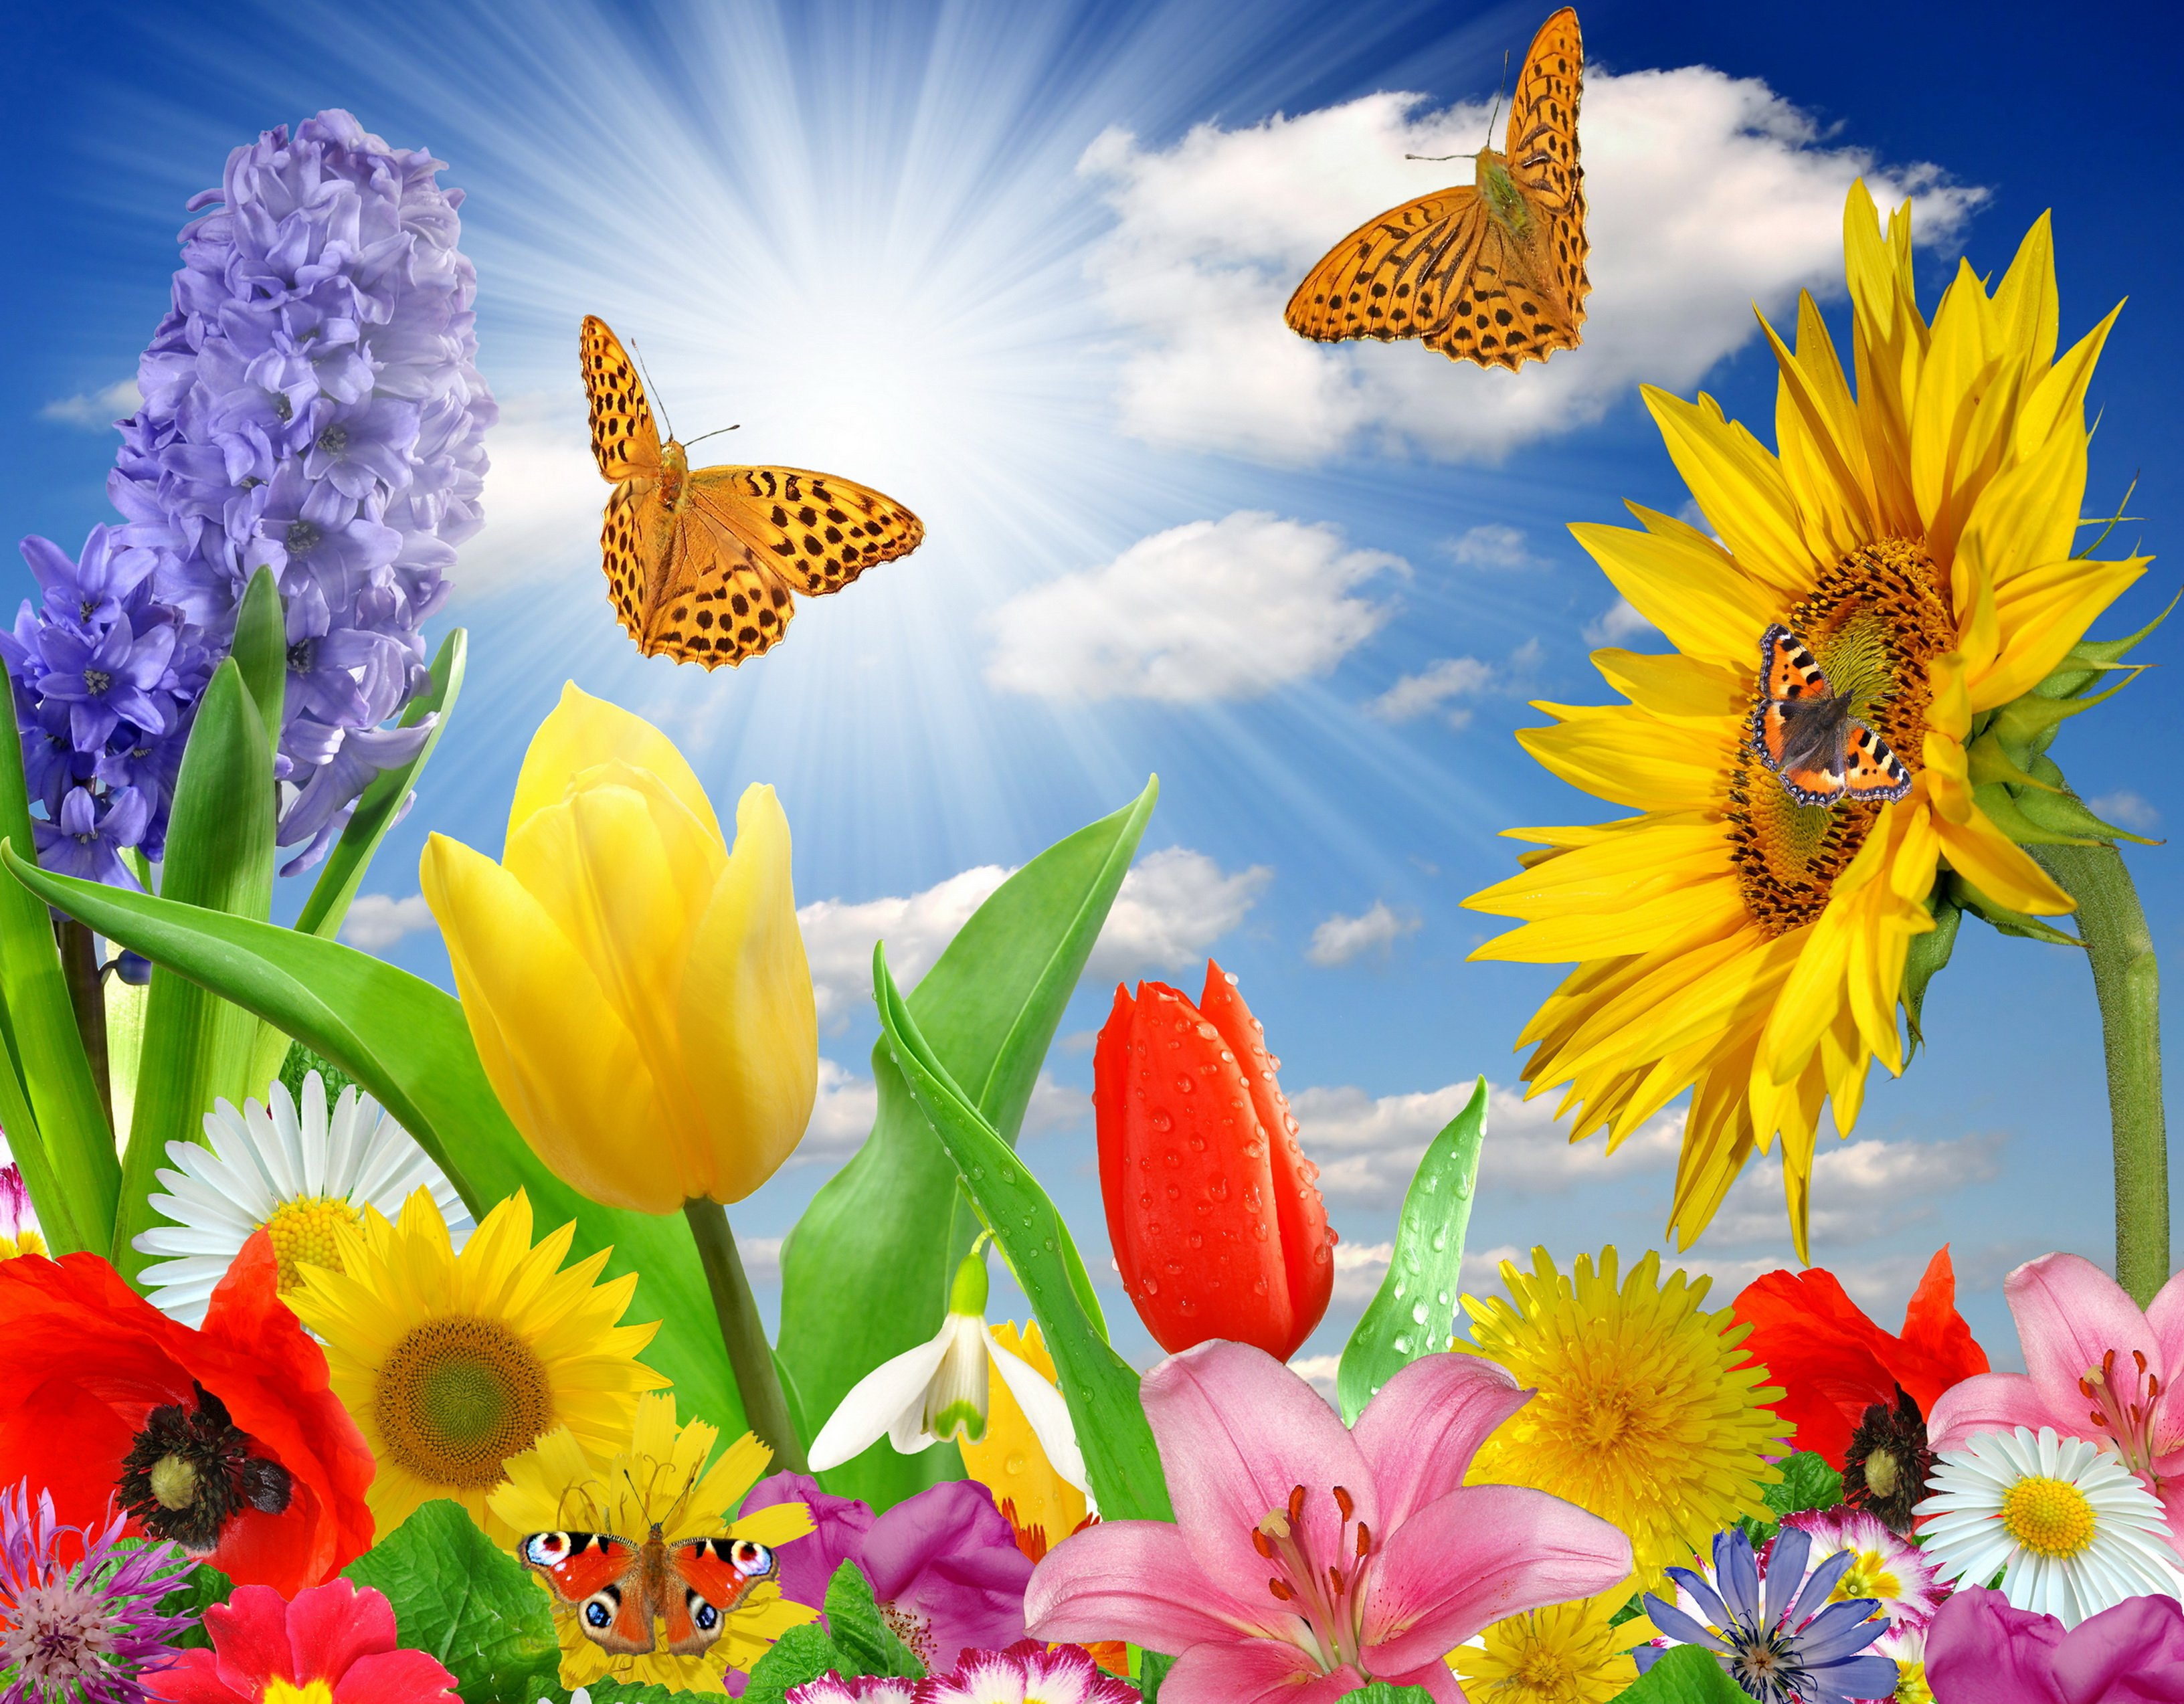 Butterfly and flowers wallpaper | Wallpaper Wide HD